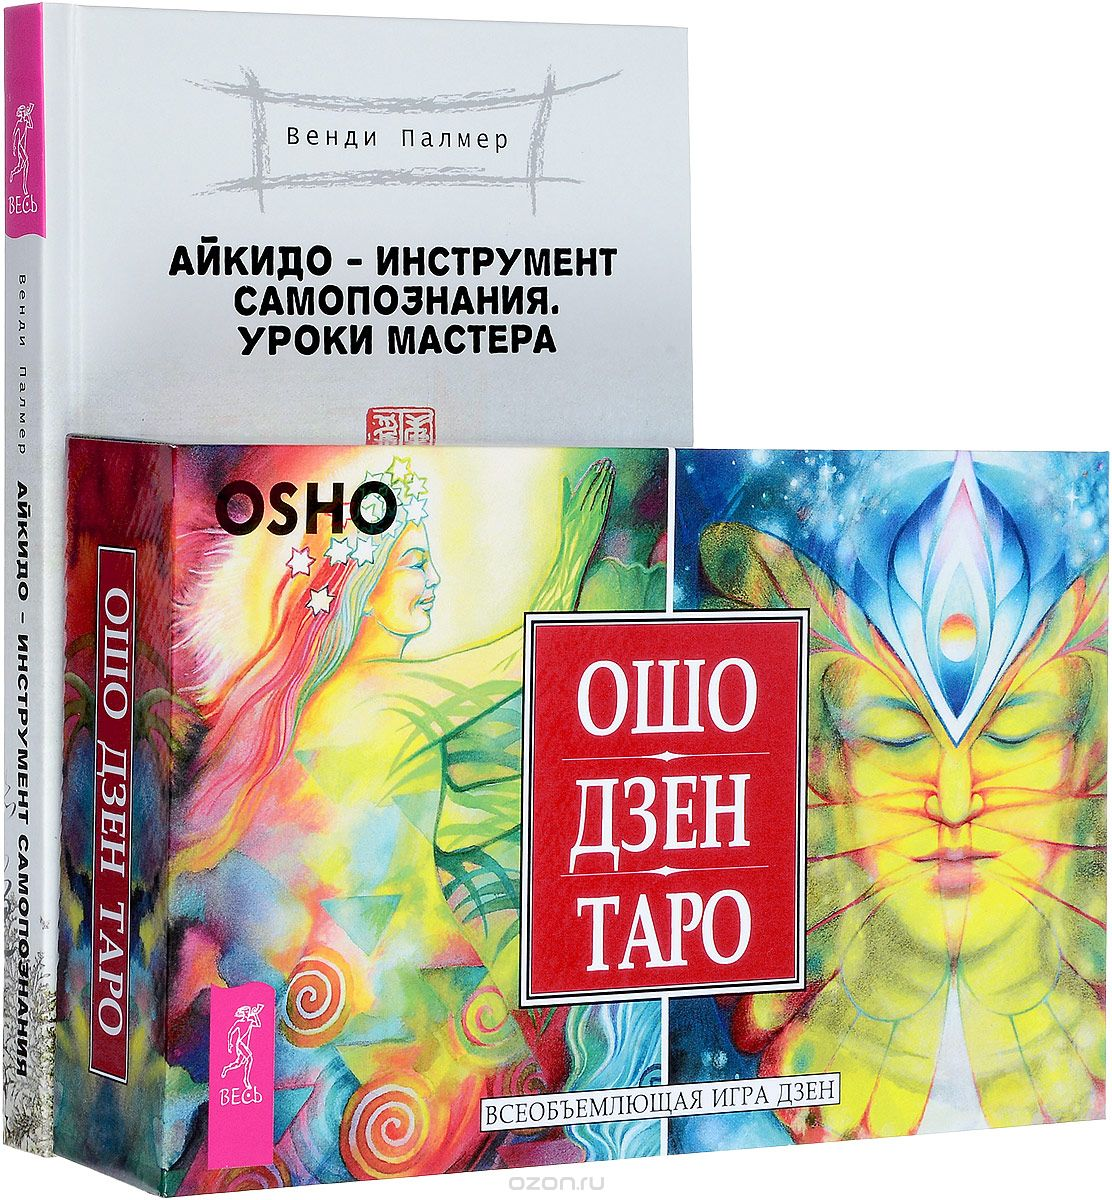 Венди Палмер: Айкидо - инструмент самопознания. Ошо Дзен Таро (комплект из 2 книг + 79 карт)